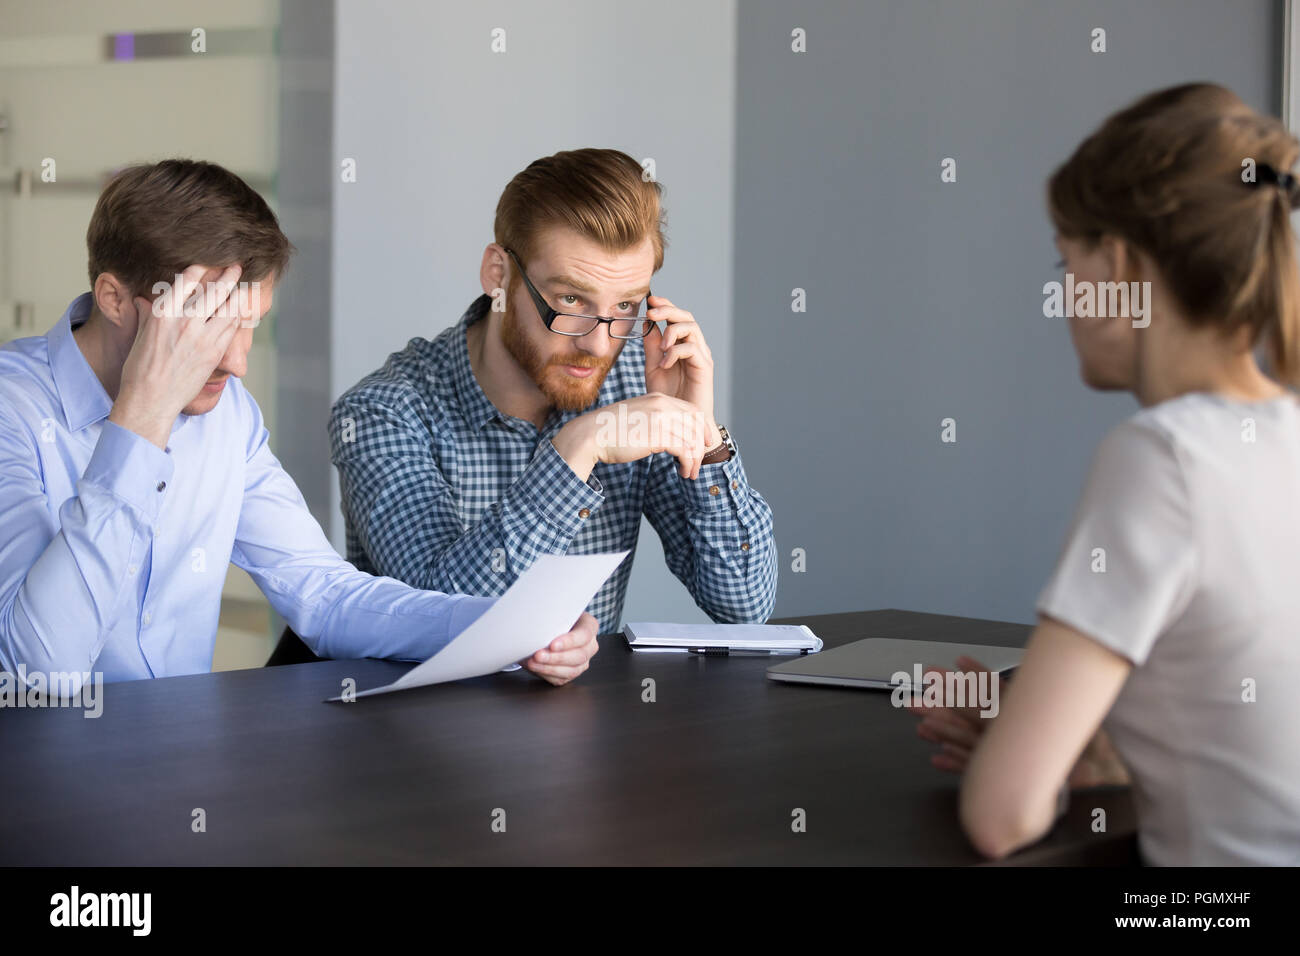 Pas sûr vu les recruteurs masculins candidate candidature Photo Stock